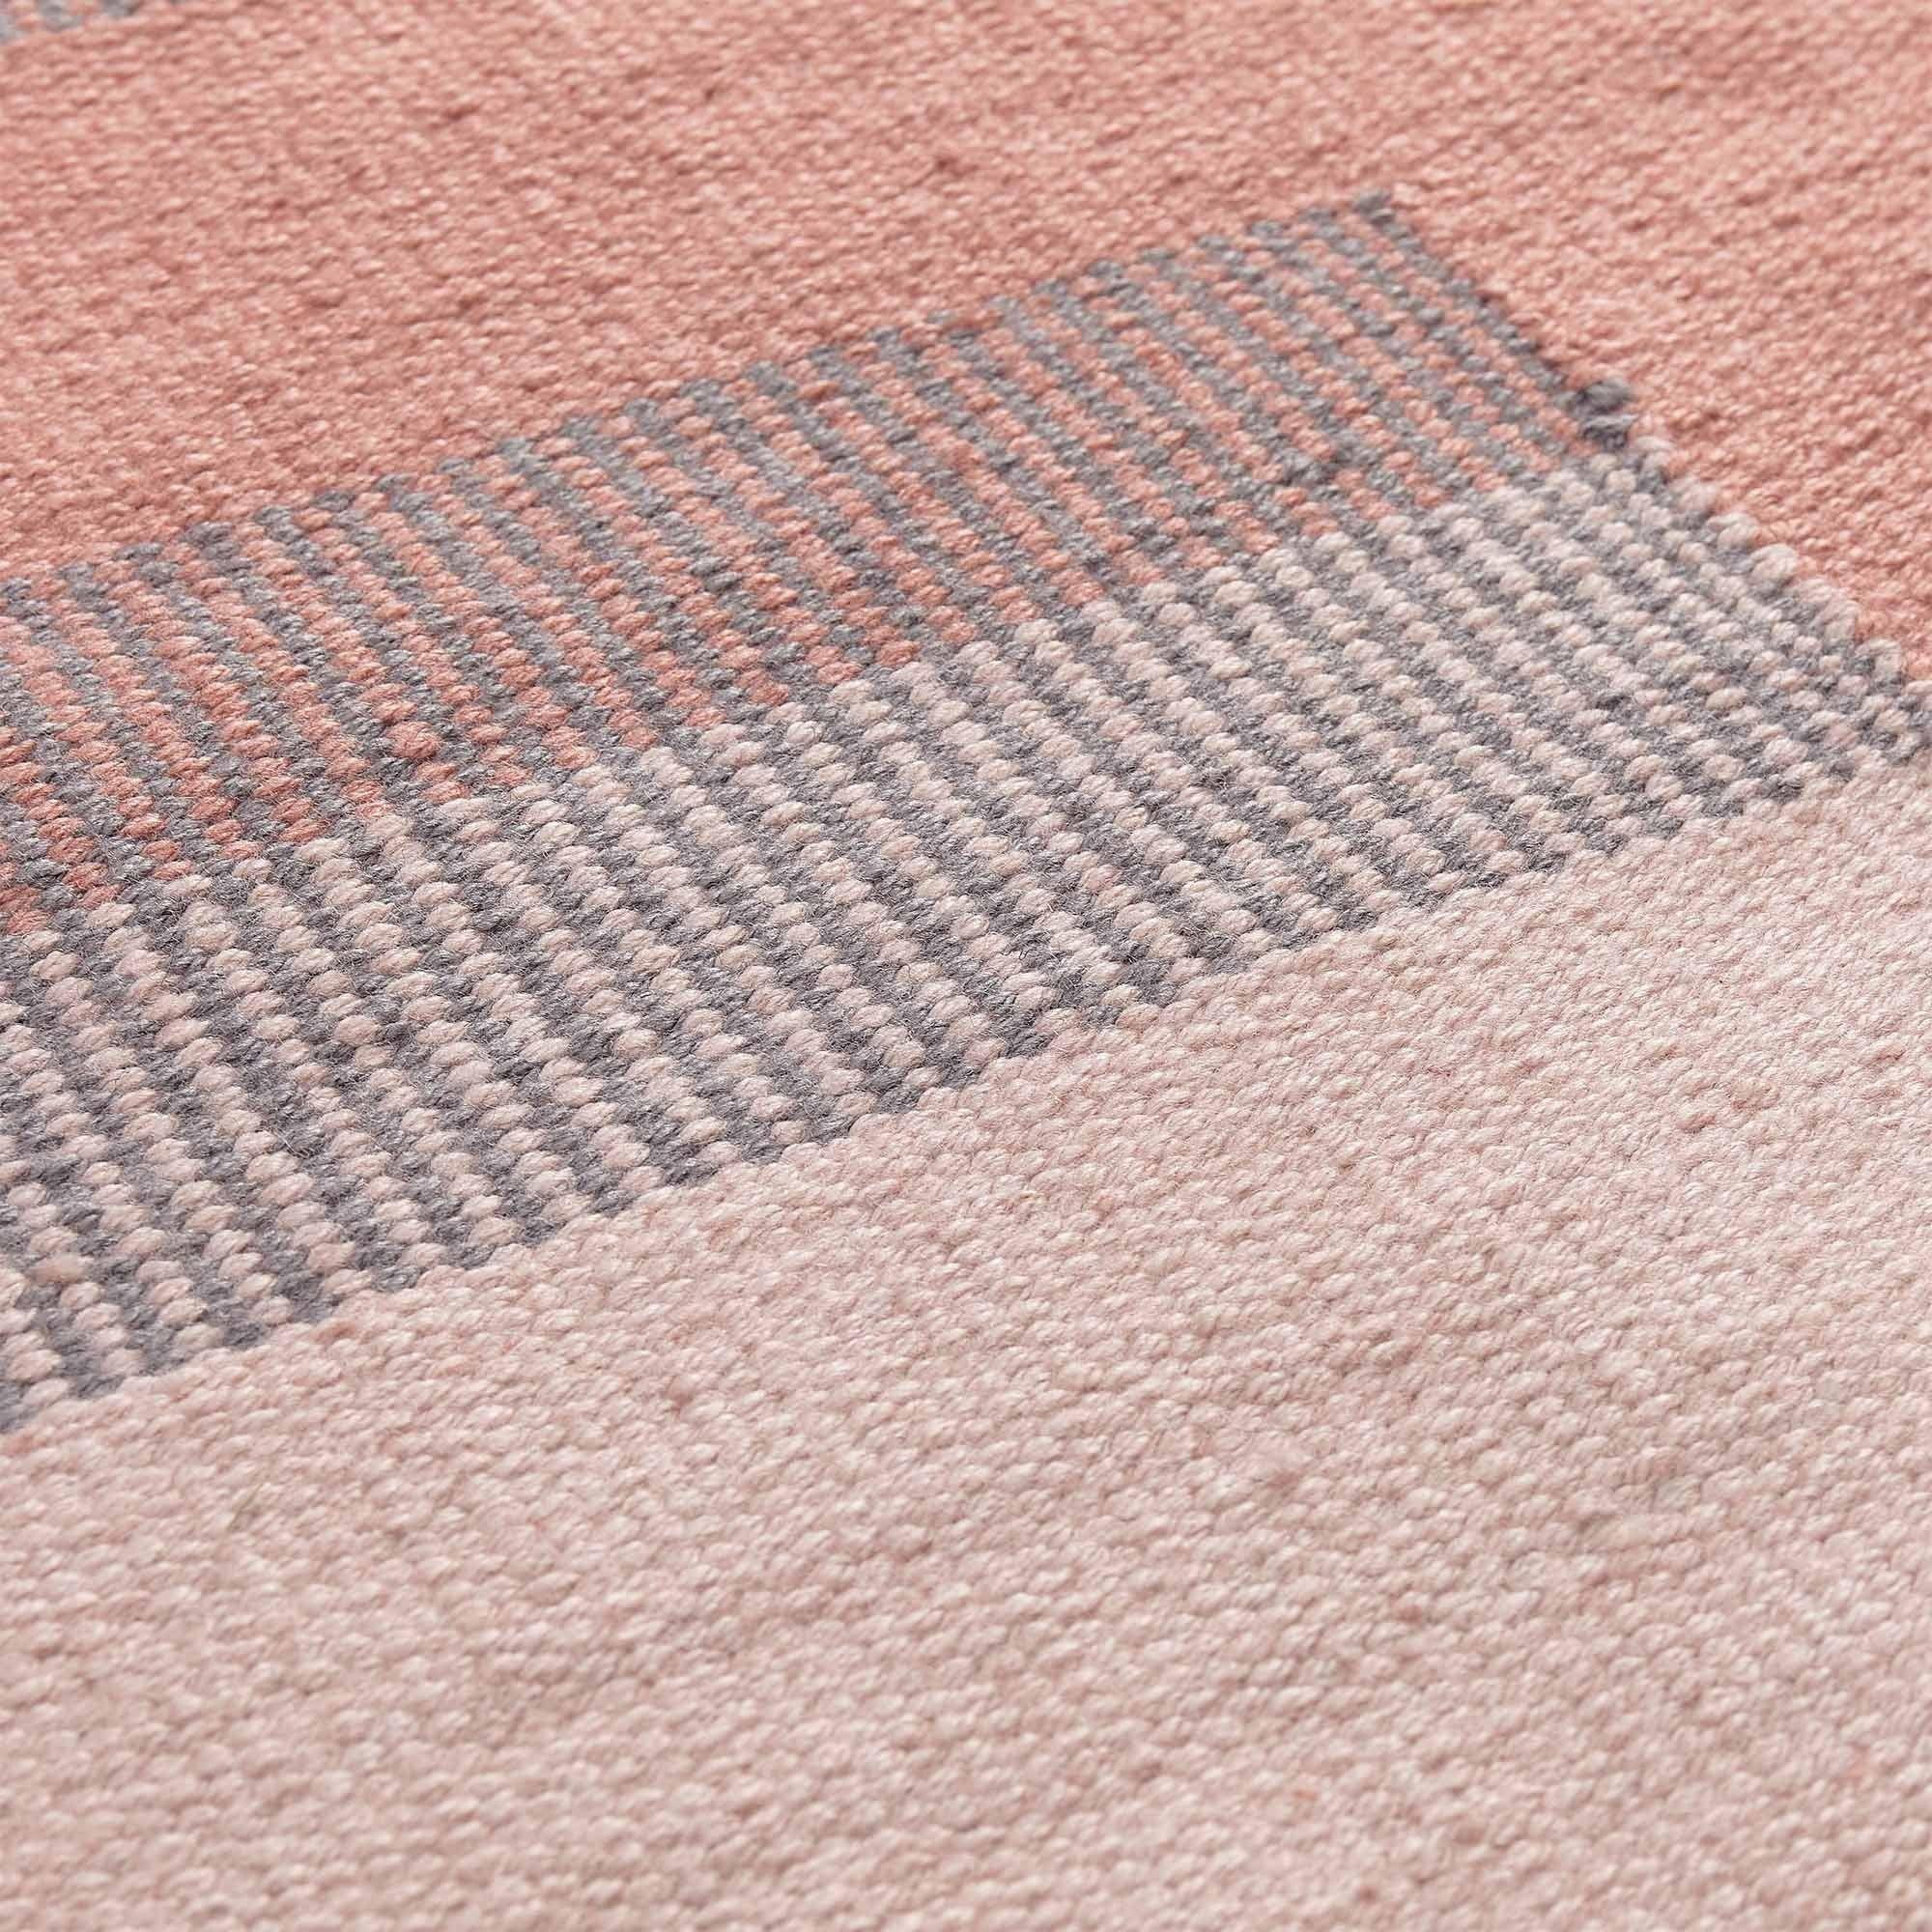 Outdoor Teppich Indari Grau Rosa Altrosa 170x240 Cm Teppich Grau Urbanara Und Versponnenes